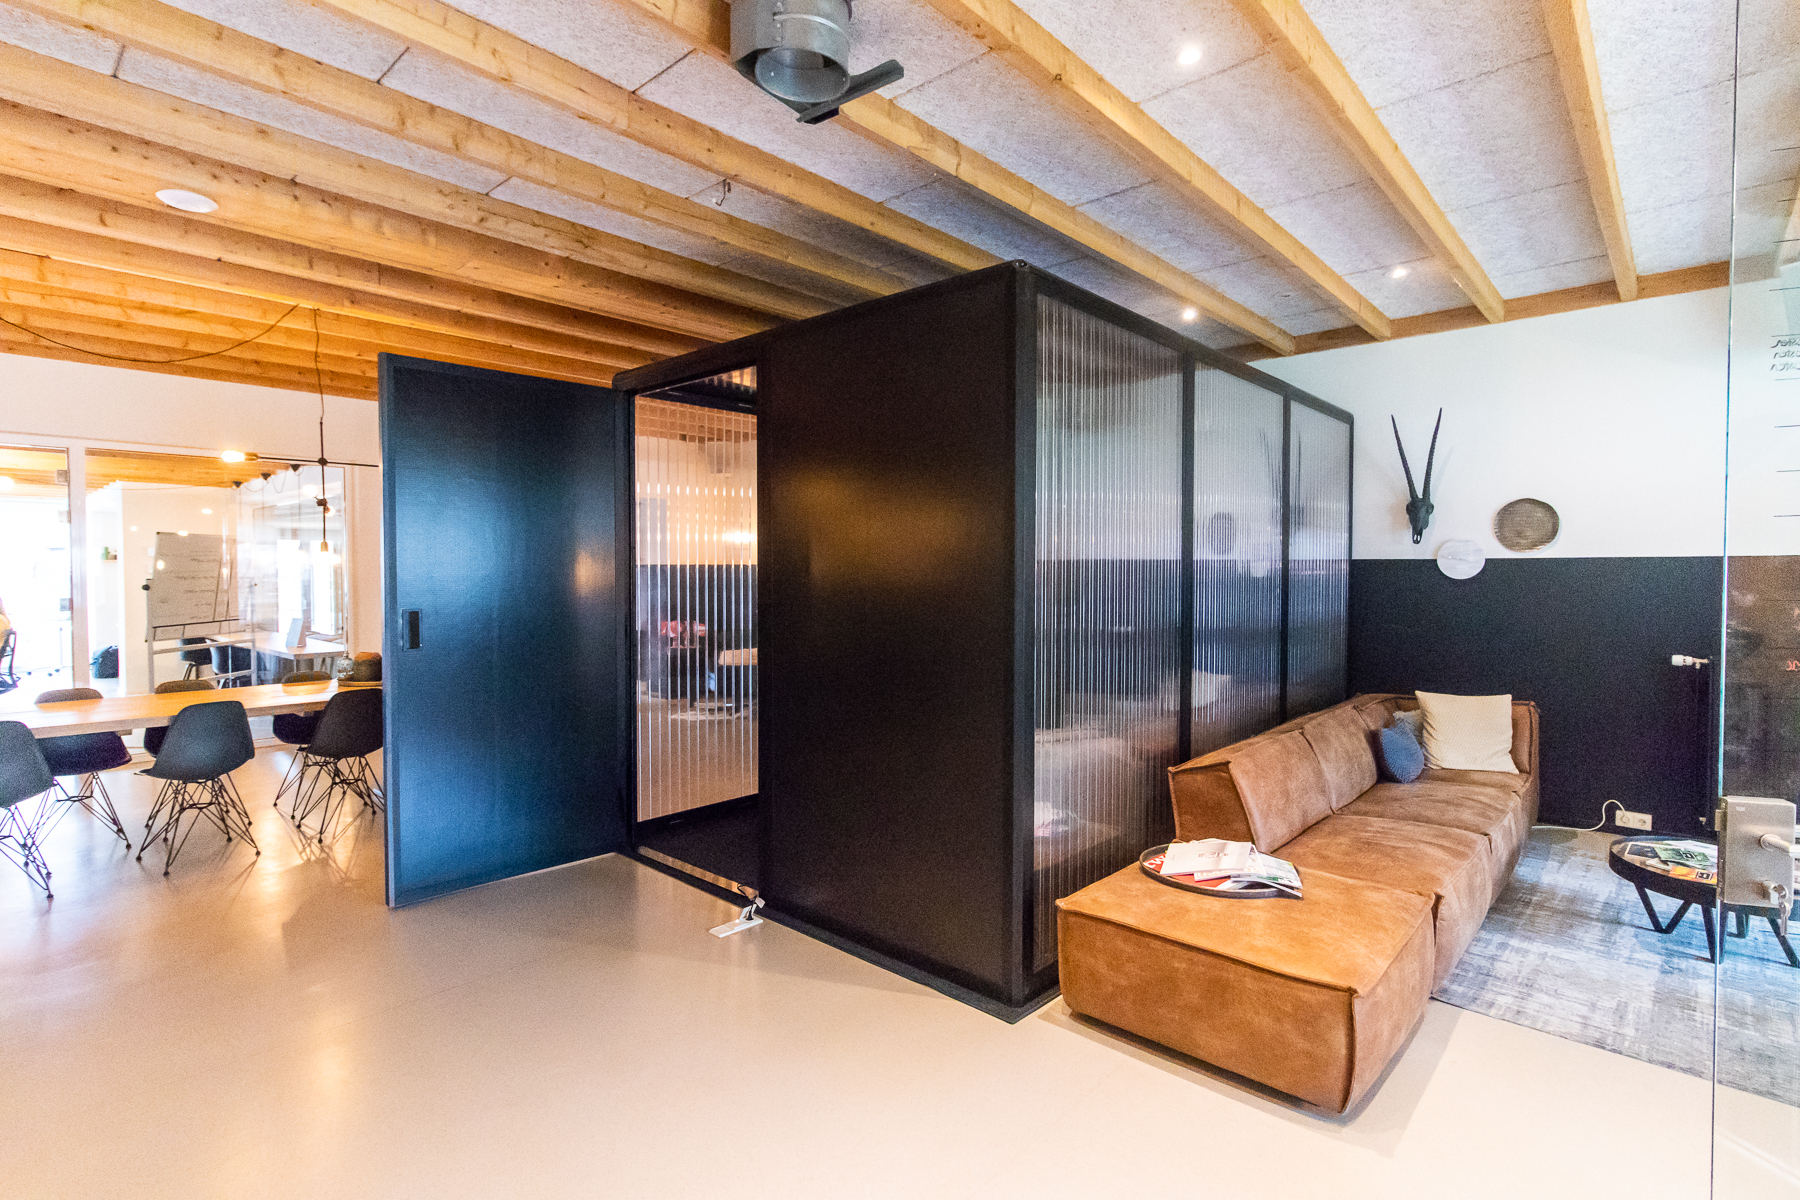 Rent office space Ootmarsumseweg 151, Albergen (11)